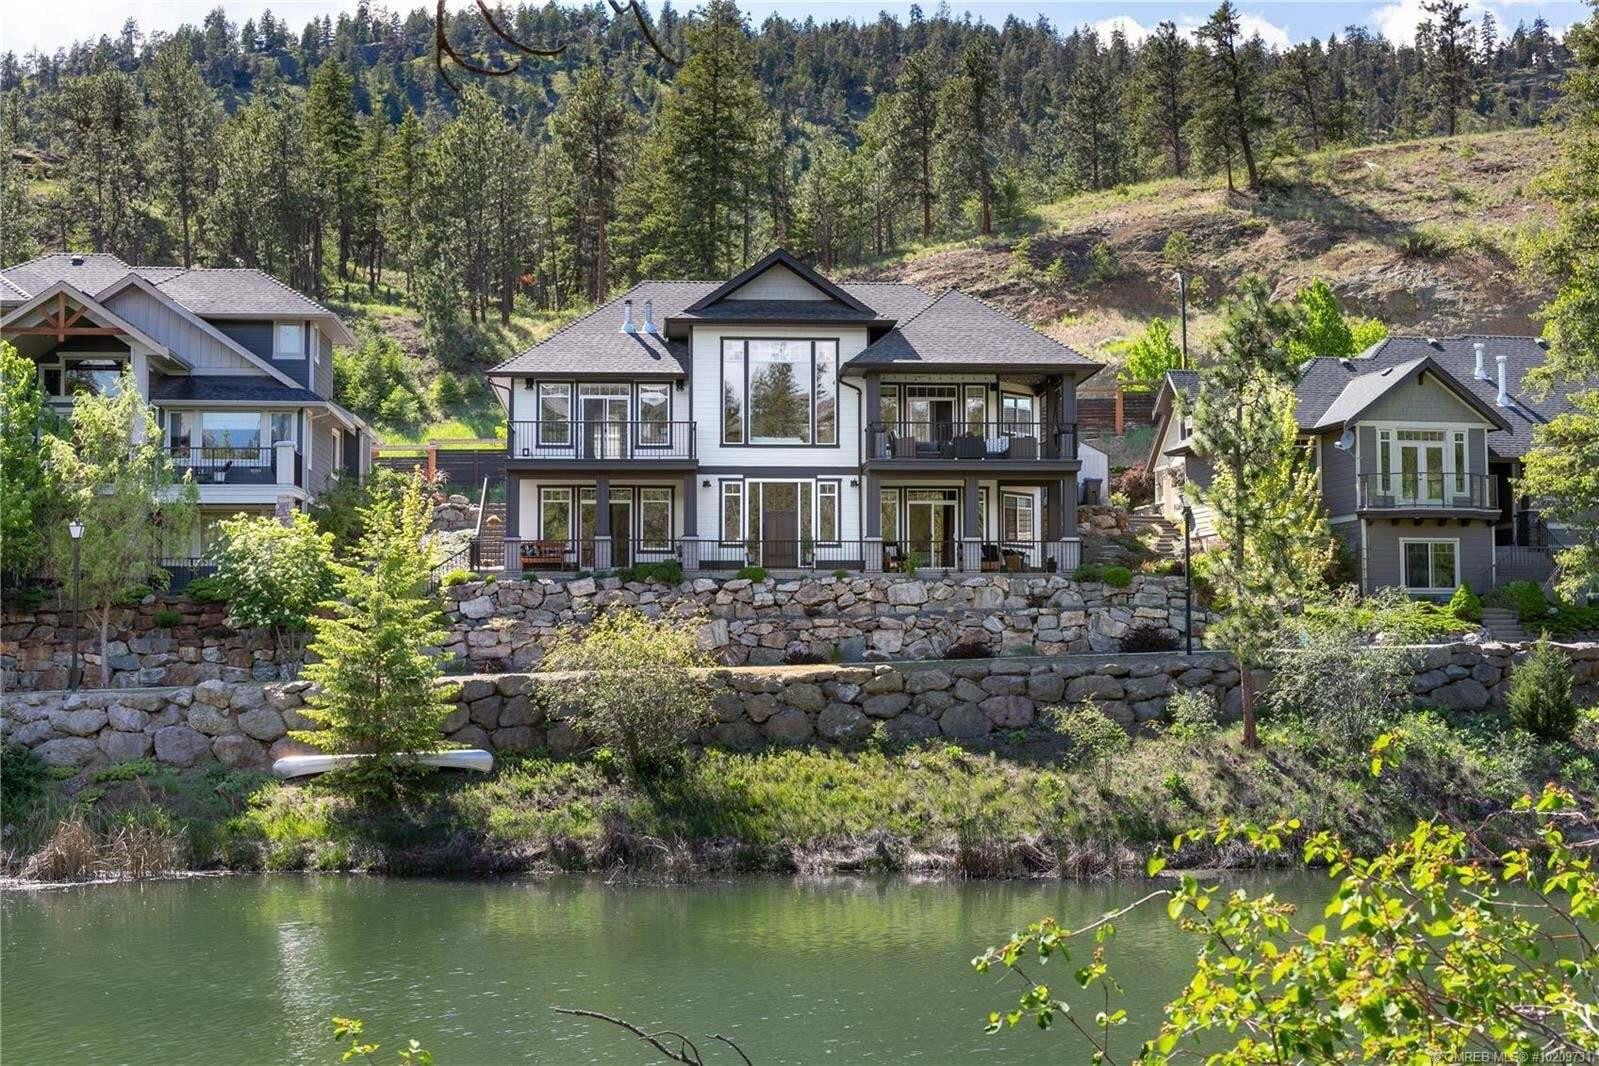 House for sale at 585 Still Pond Ln Kelowna British Columbia - MLS: 10209731